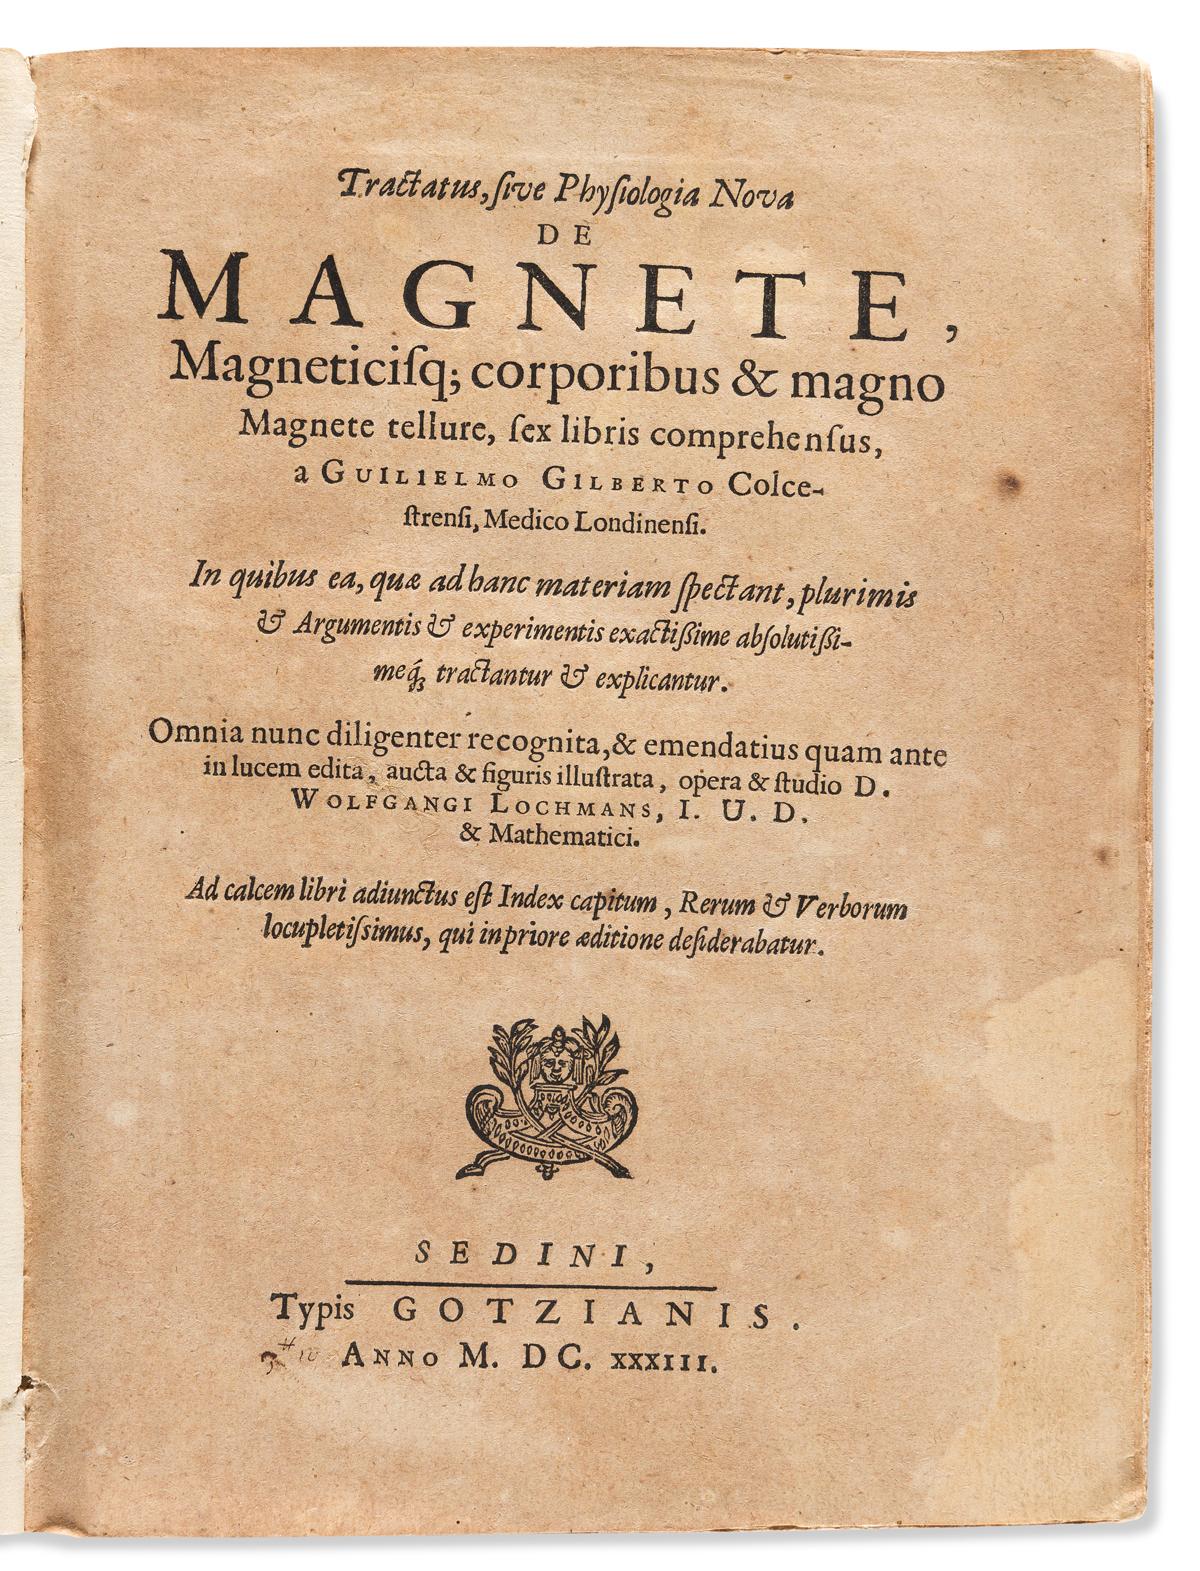 Gilbert, William (1544-1603) Tractatus, sive Physiologia Nova de Magnete.